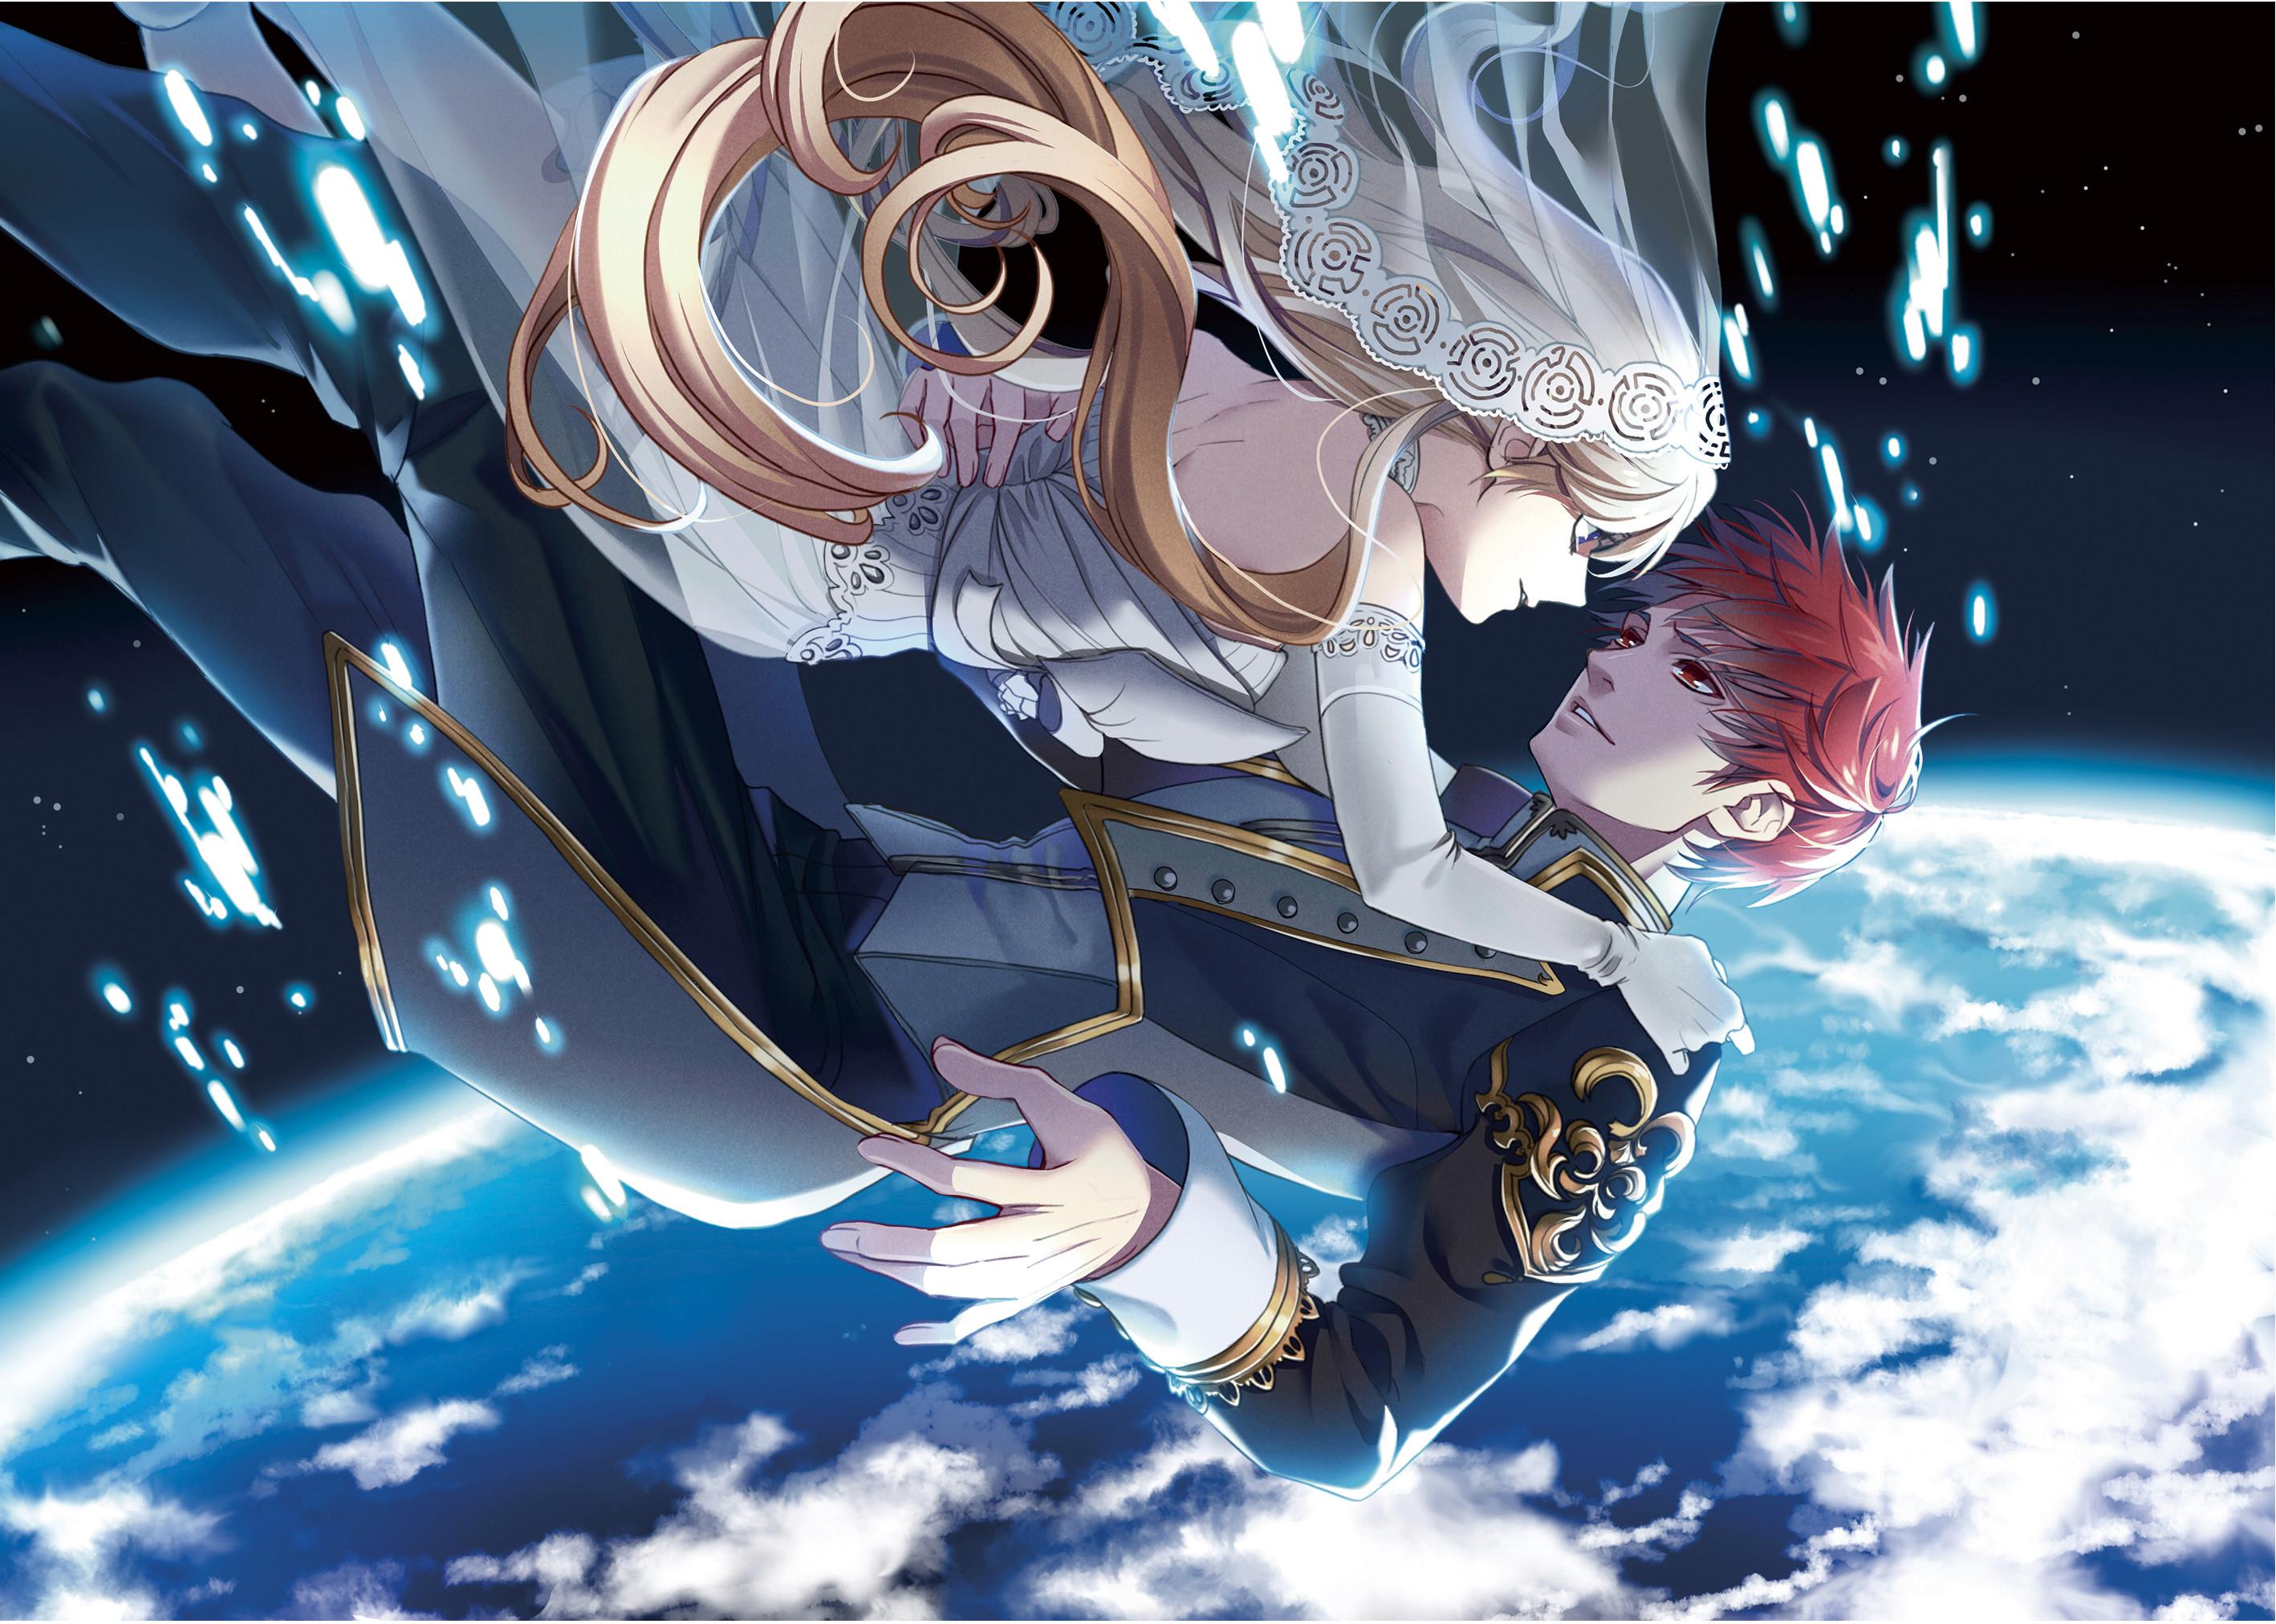 Res: 2836x2024, Anime Girl And Boy Wallpaper Desktop Background #PLG